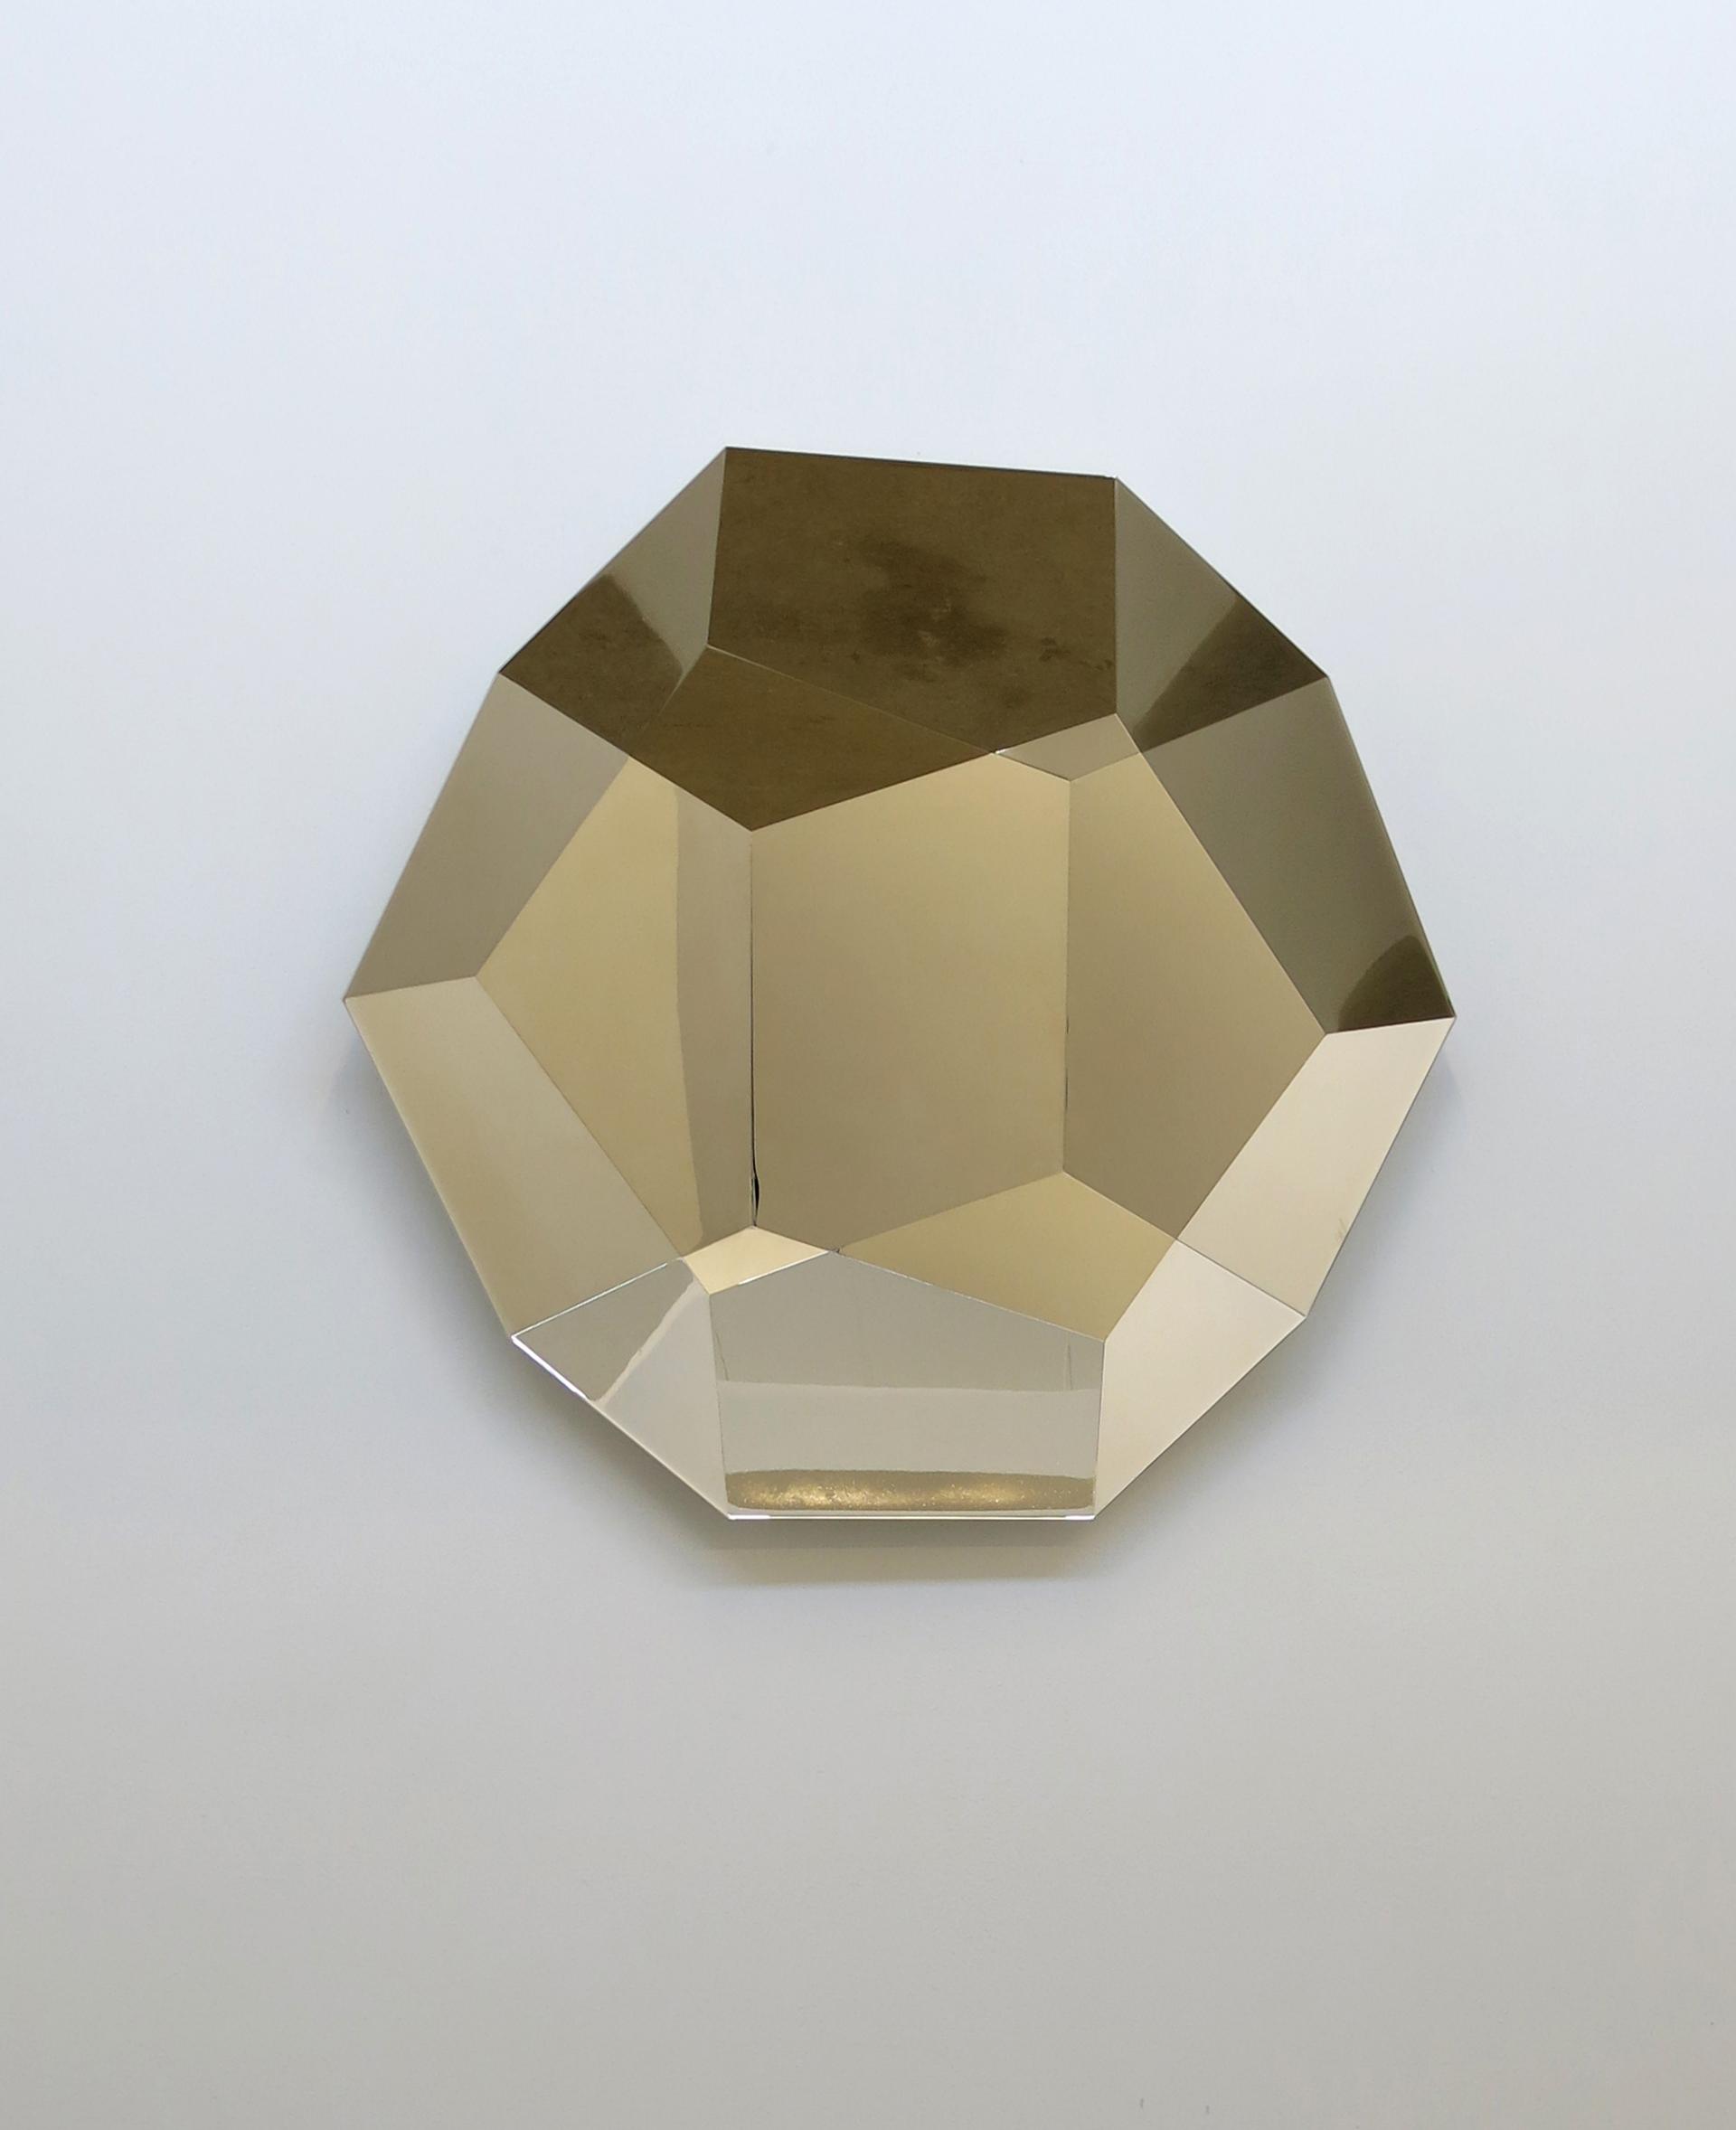 Kaleidoscope , 2013 Acier, nickel 106 x 106 x 10 cm